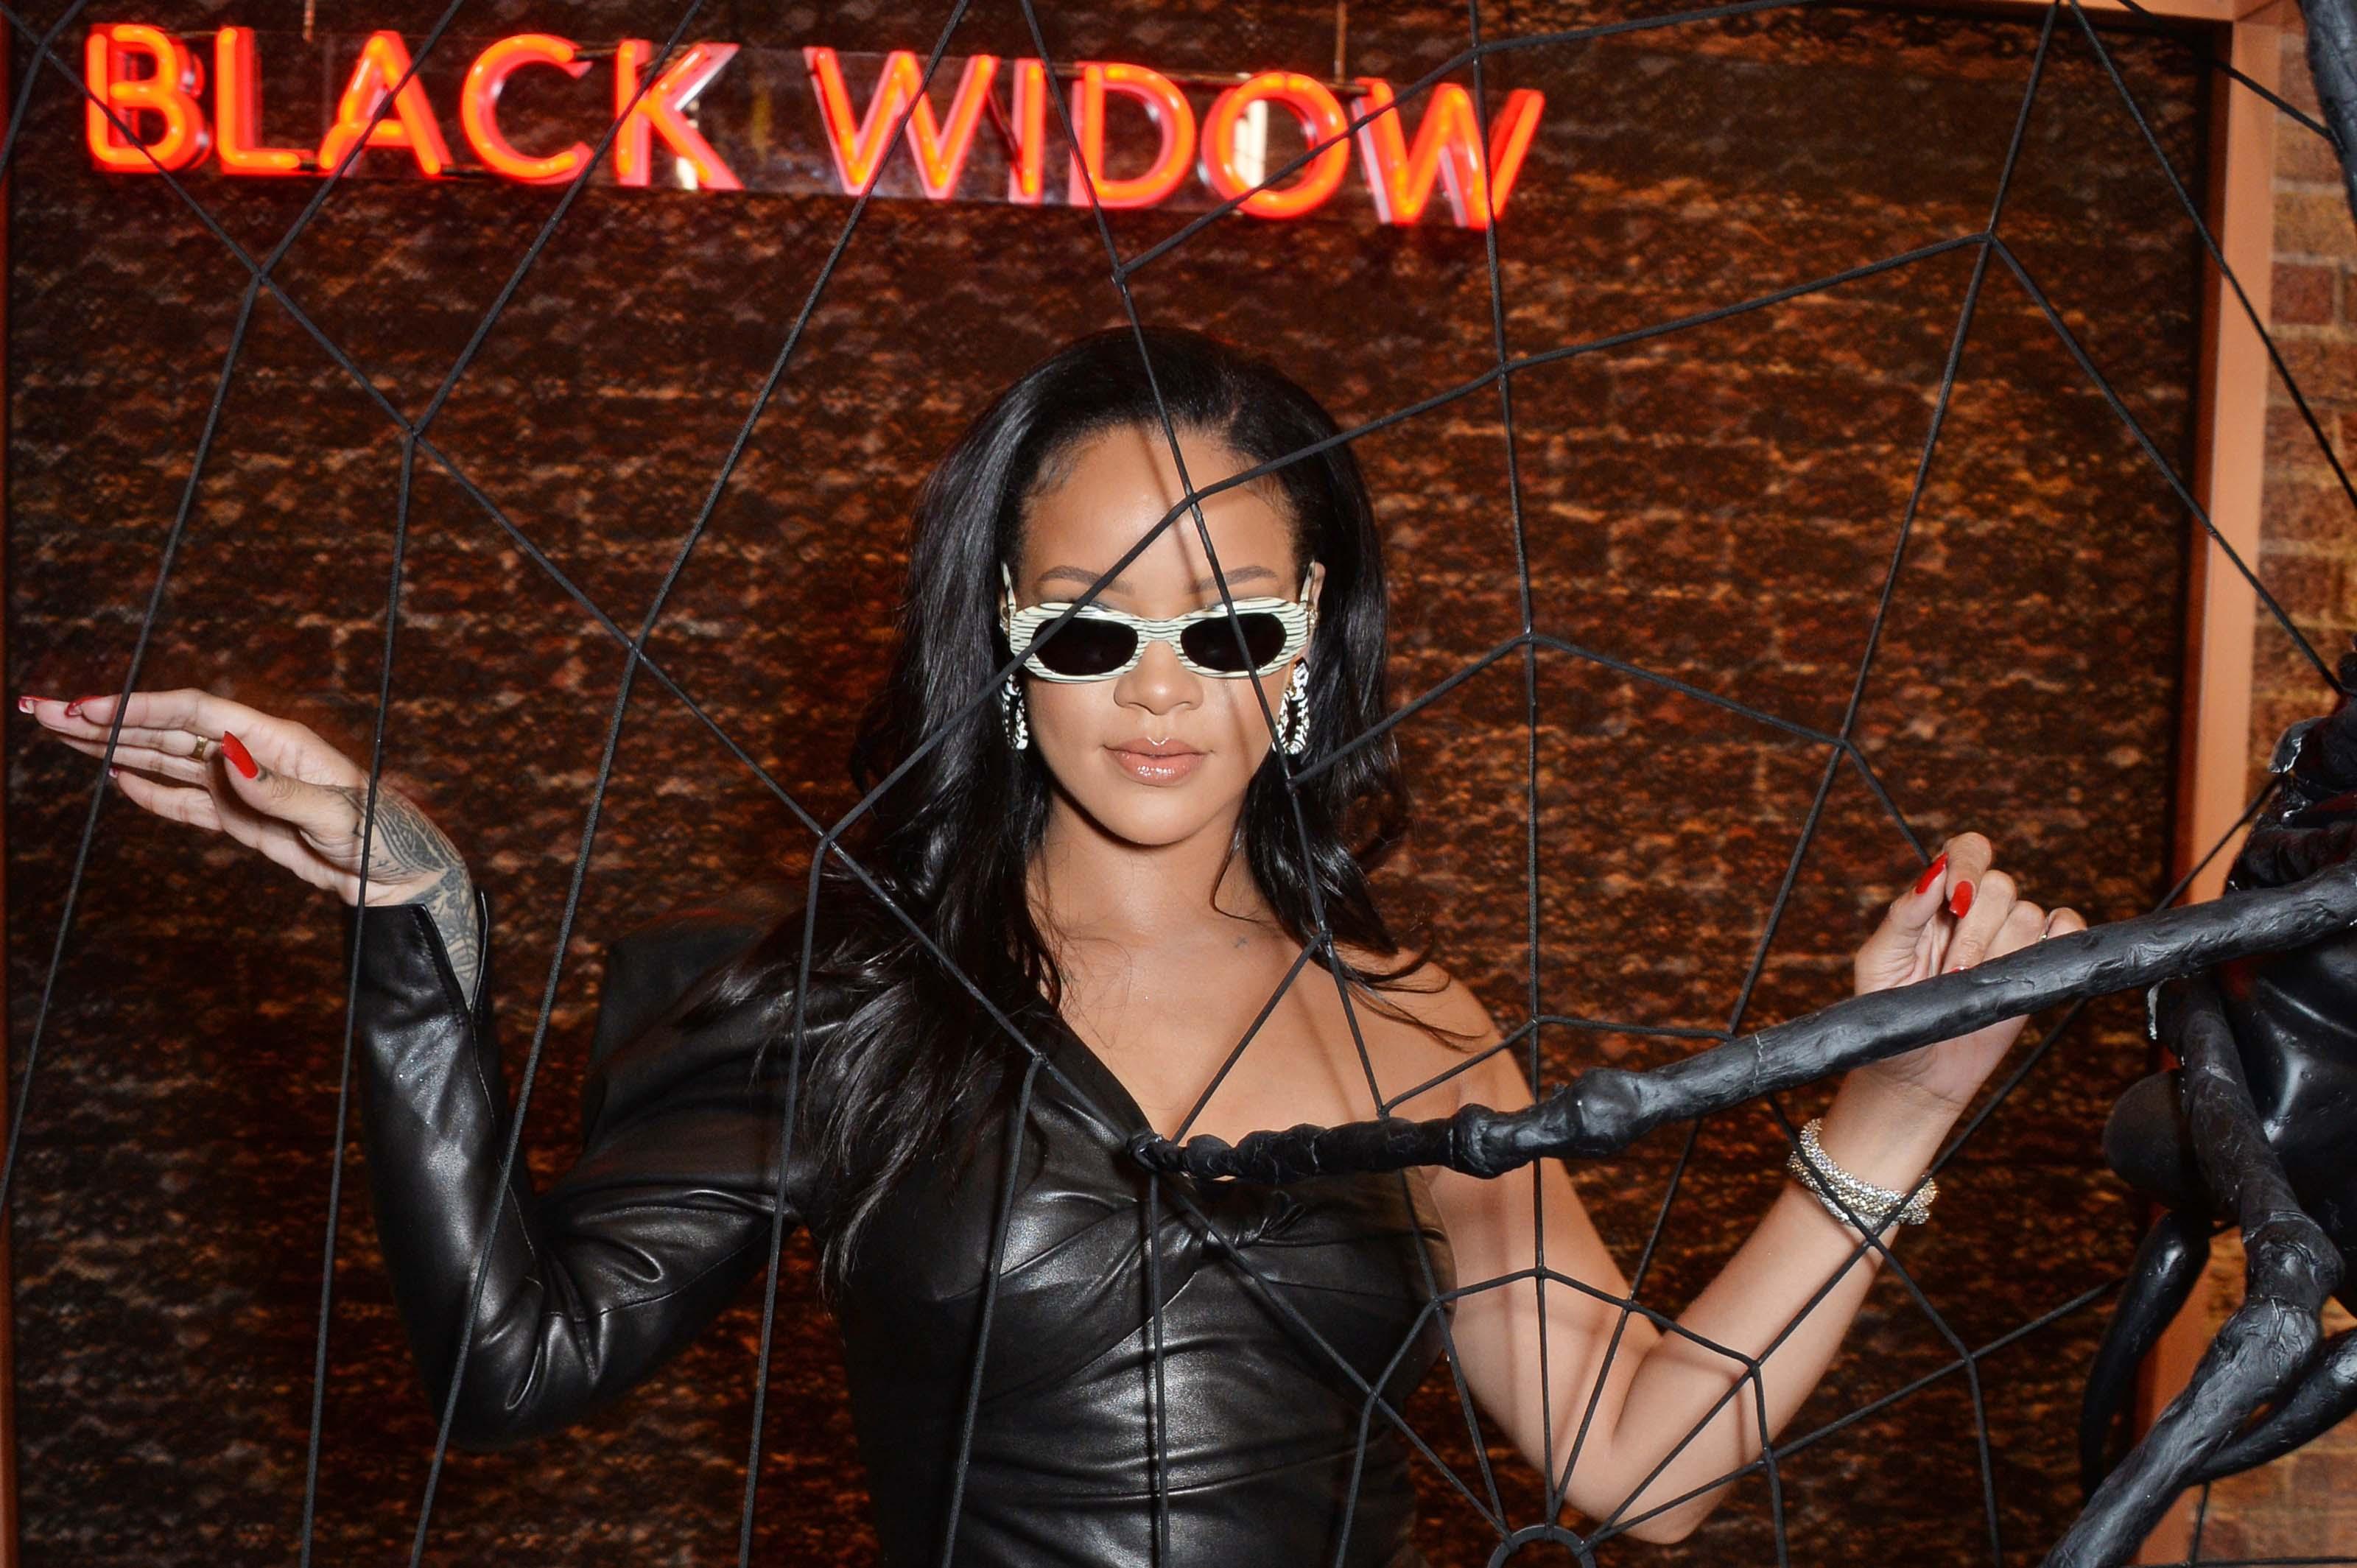 Rihanna attends Savage X Fenty pop-up shop launch